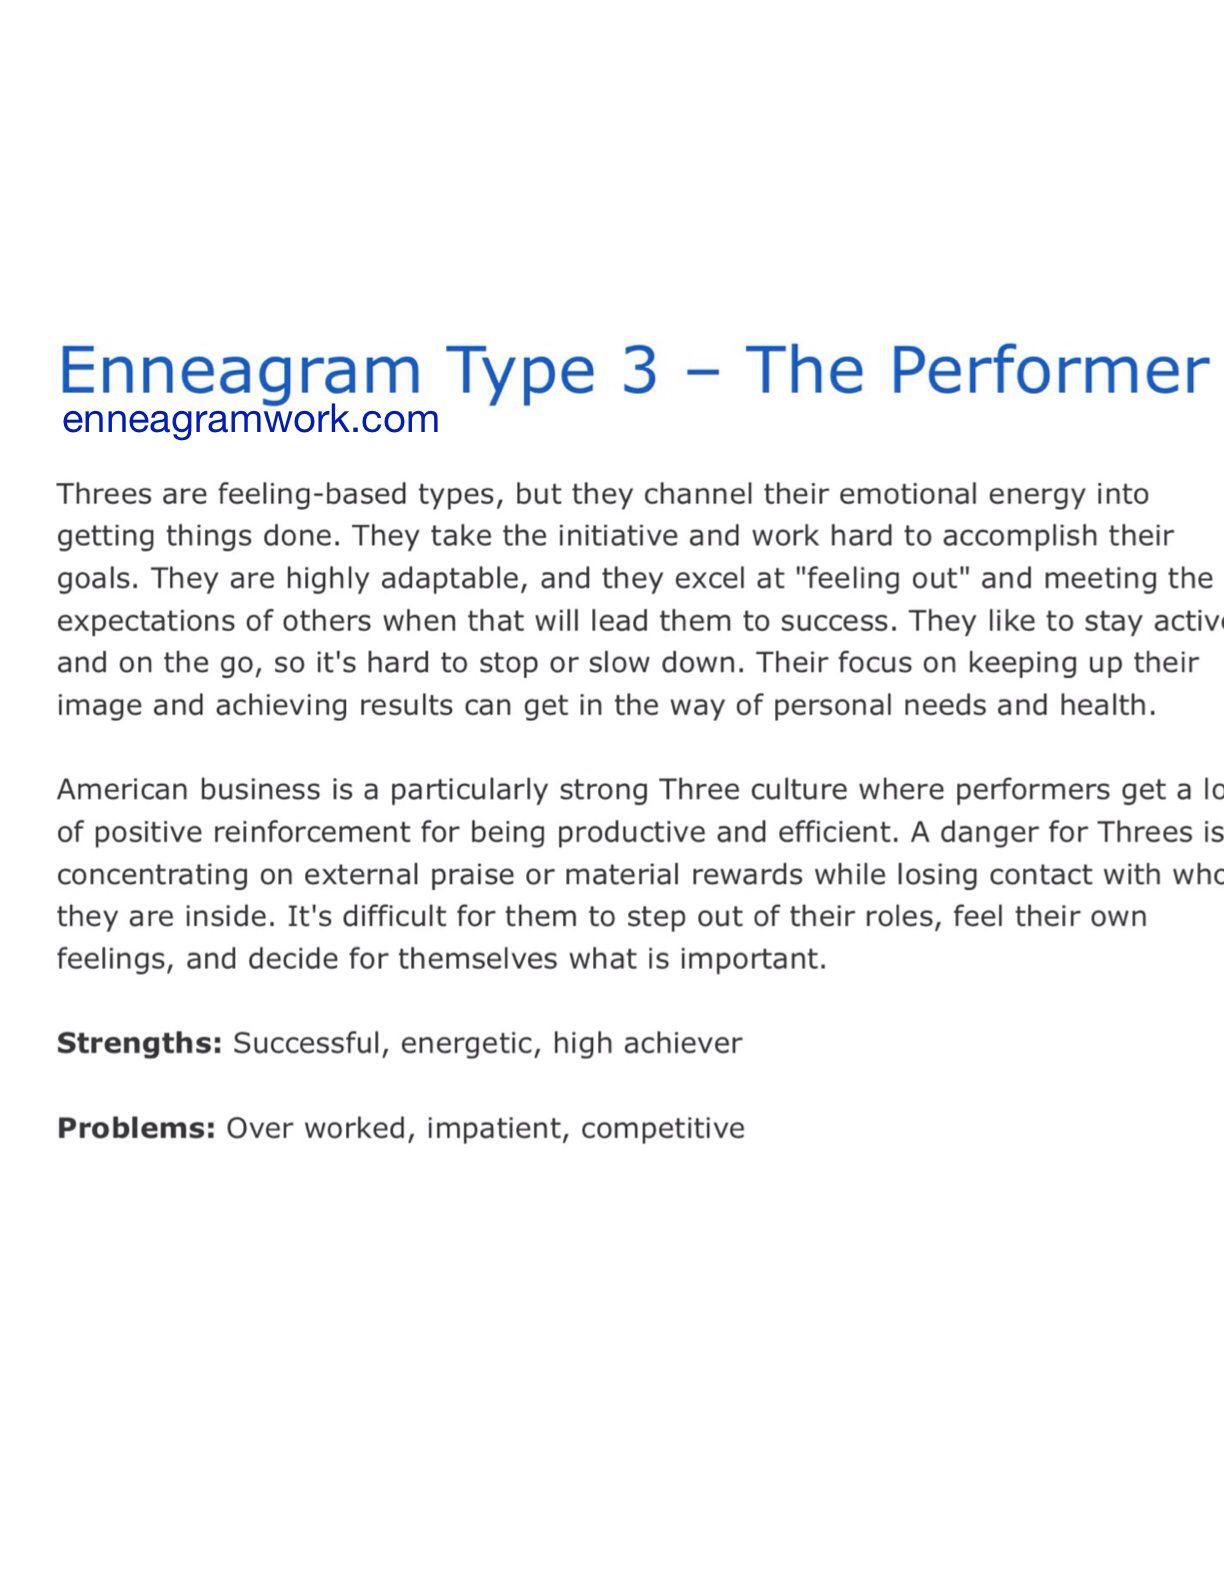 Enneagram type 3 enneagramwork.com